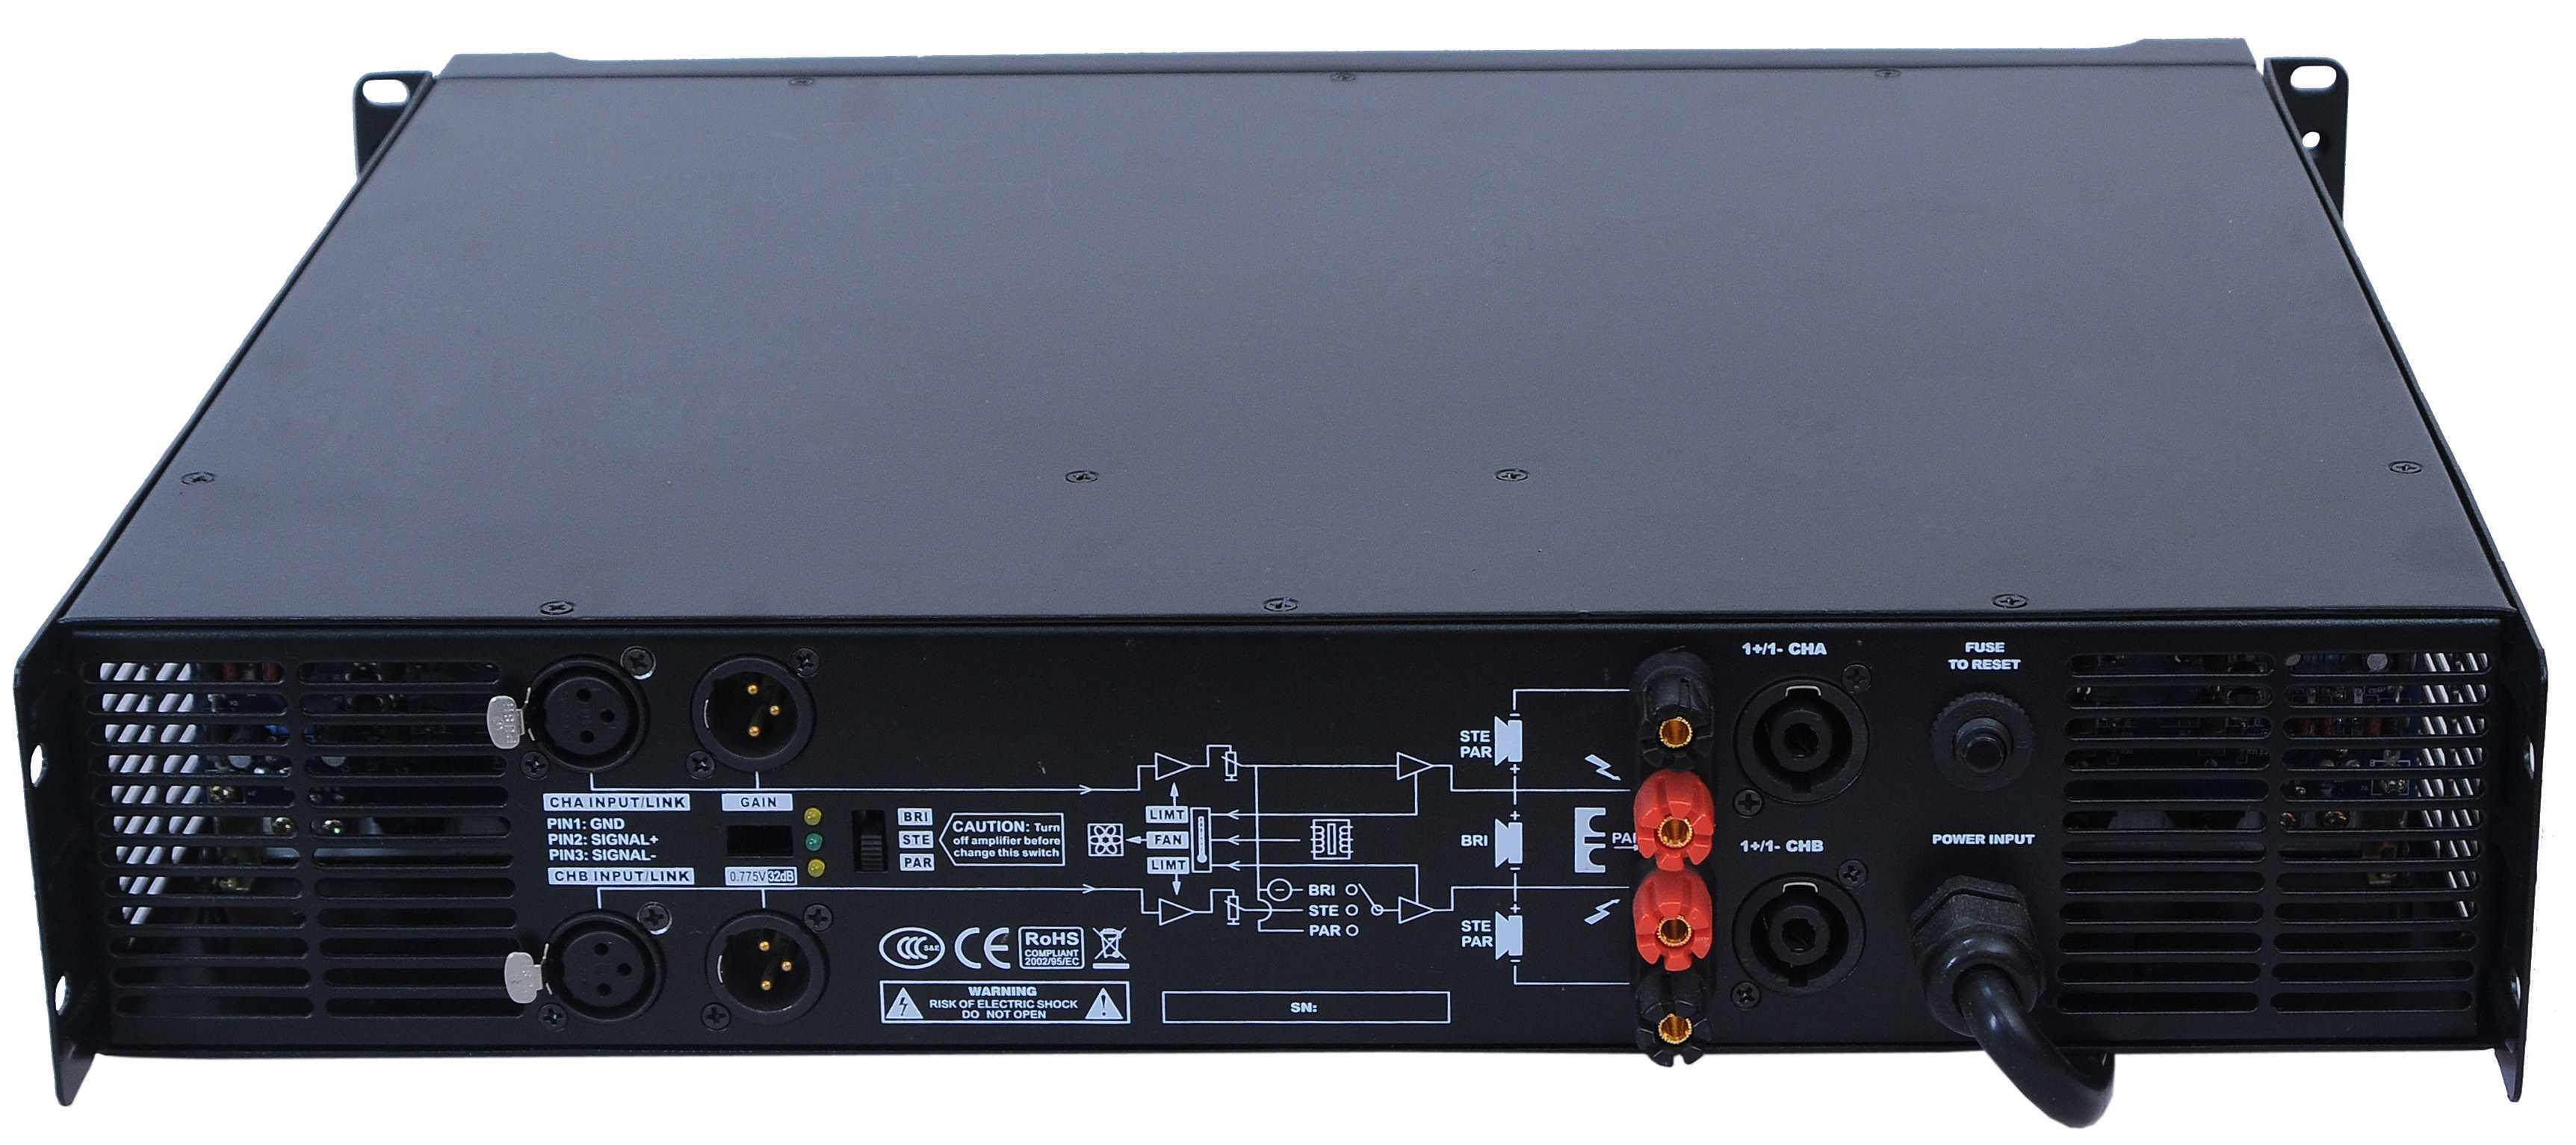 Ca Series, 2 Channels Professional Power Amplifier 2u Standard Cabinet